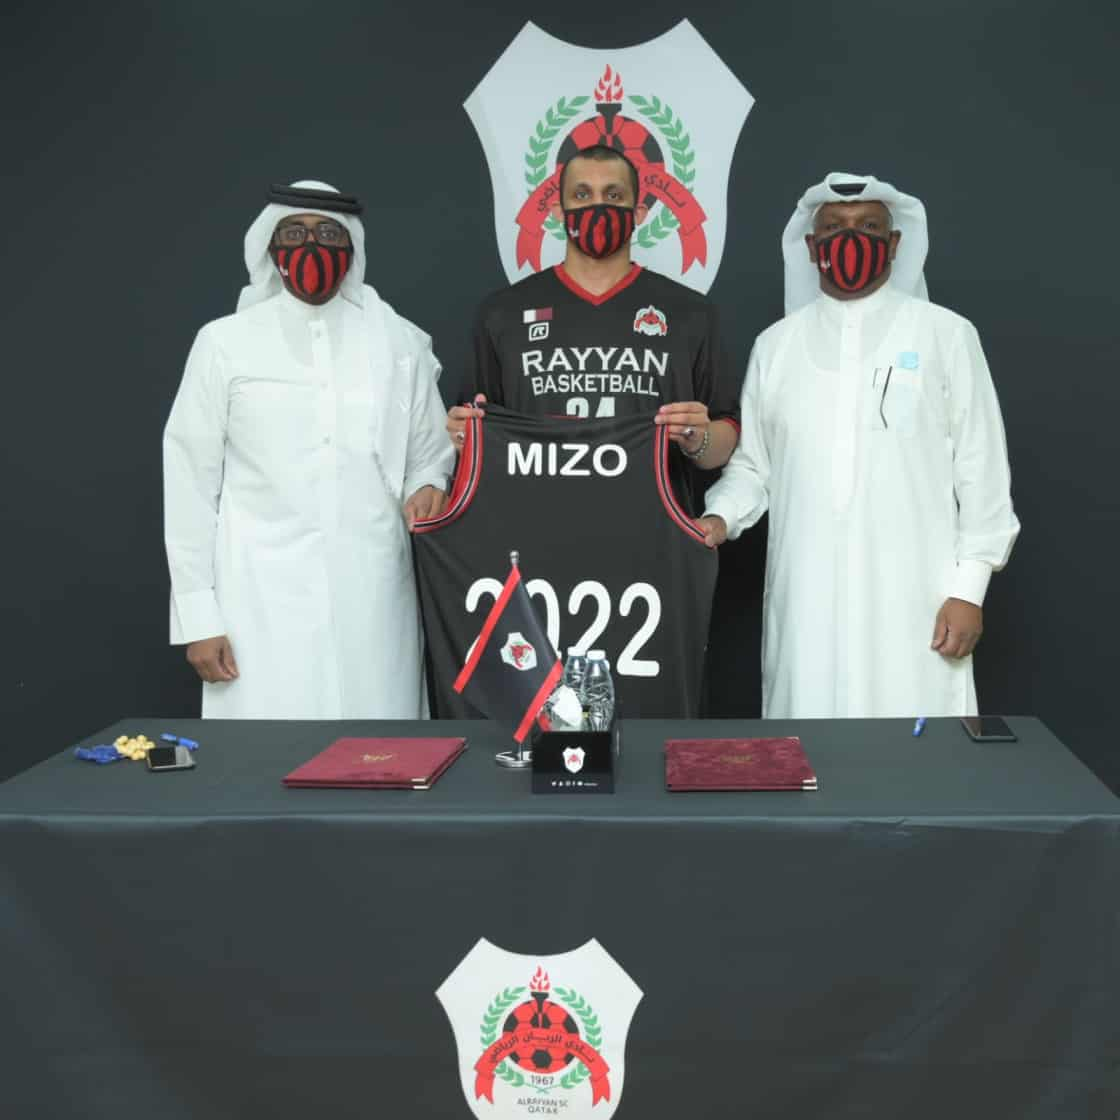 Mizo Amin Renews Basketball Contract with Al Rayyan SC until 2022